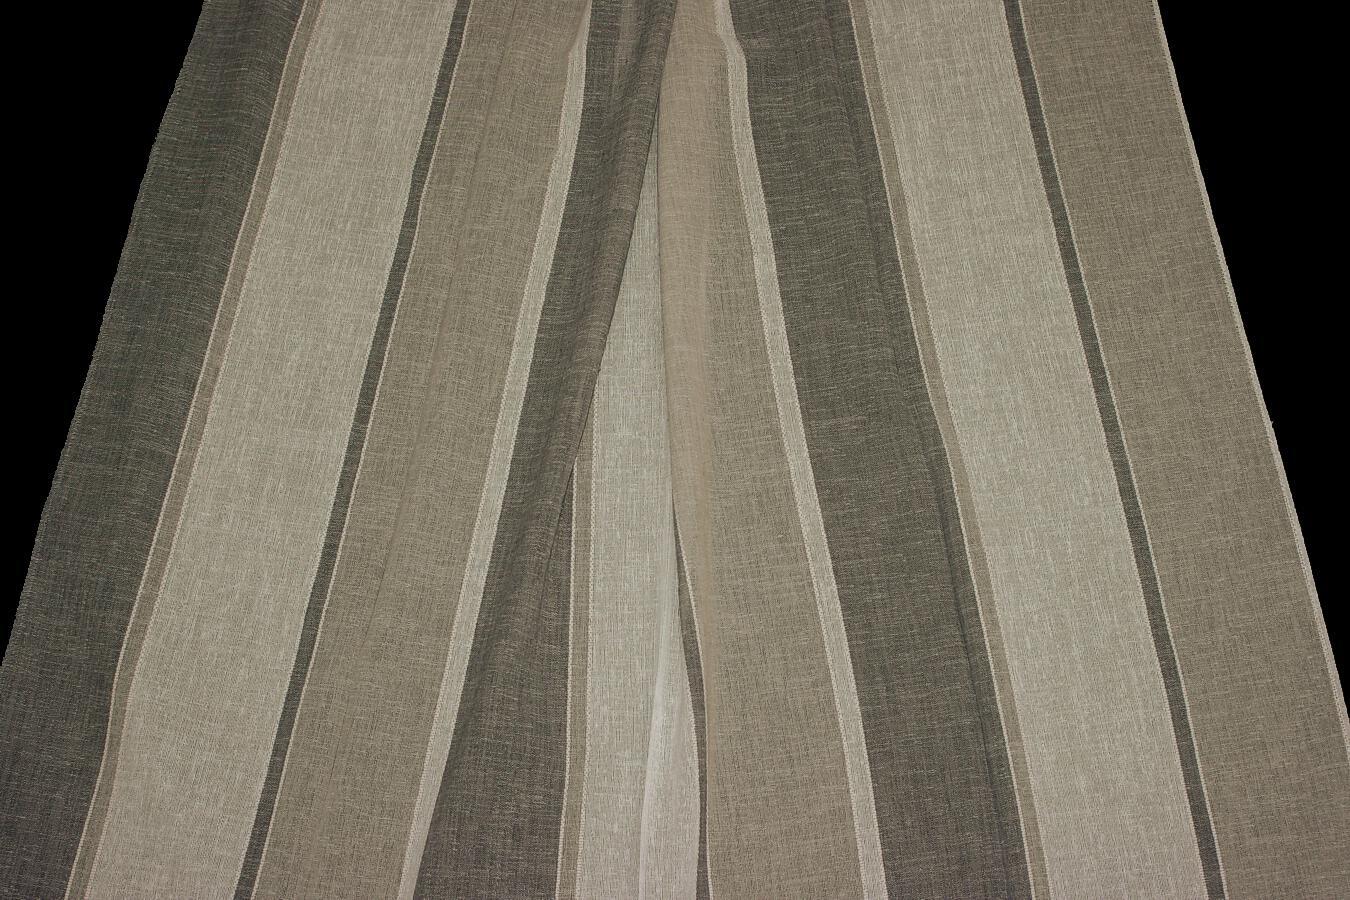 Záclona Prescott Šíře: 300 cm 50 šedobílá